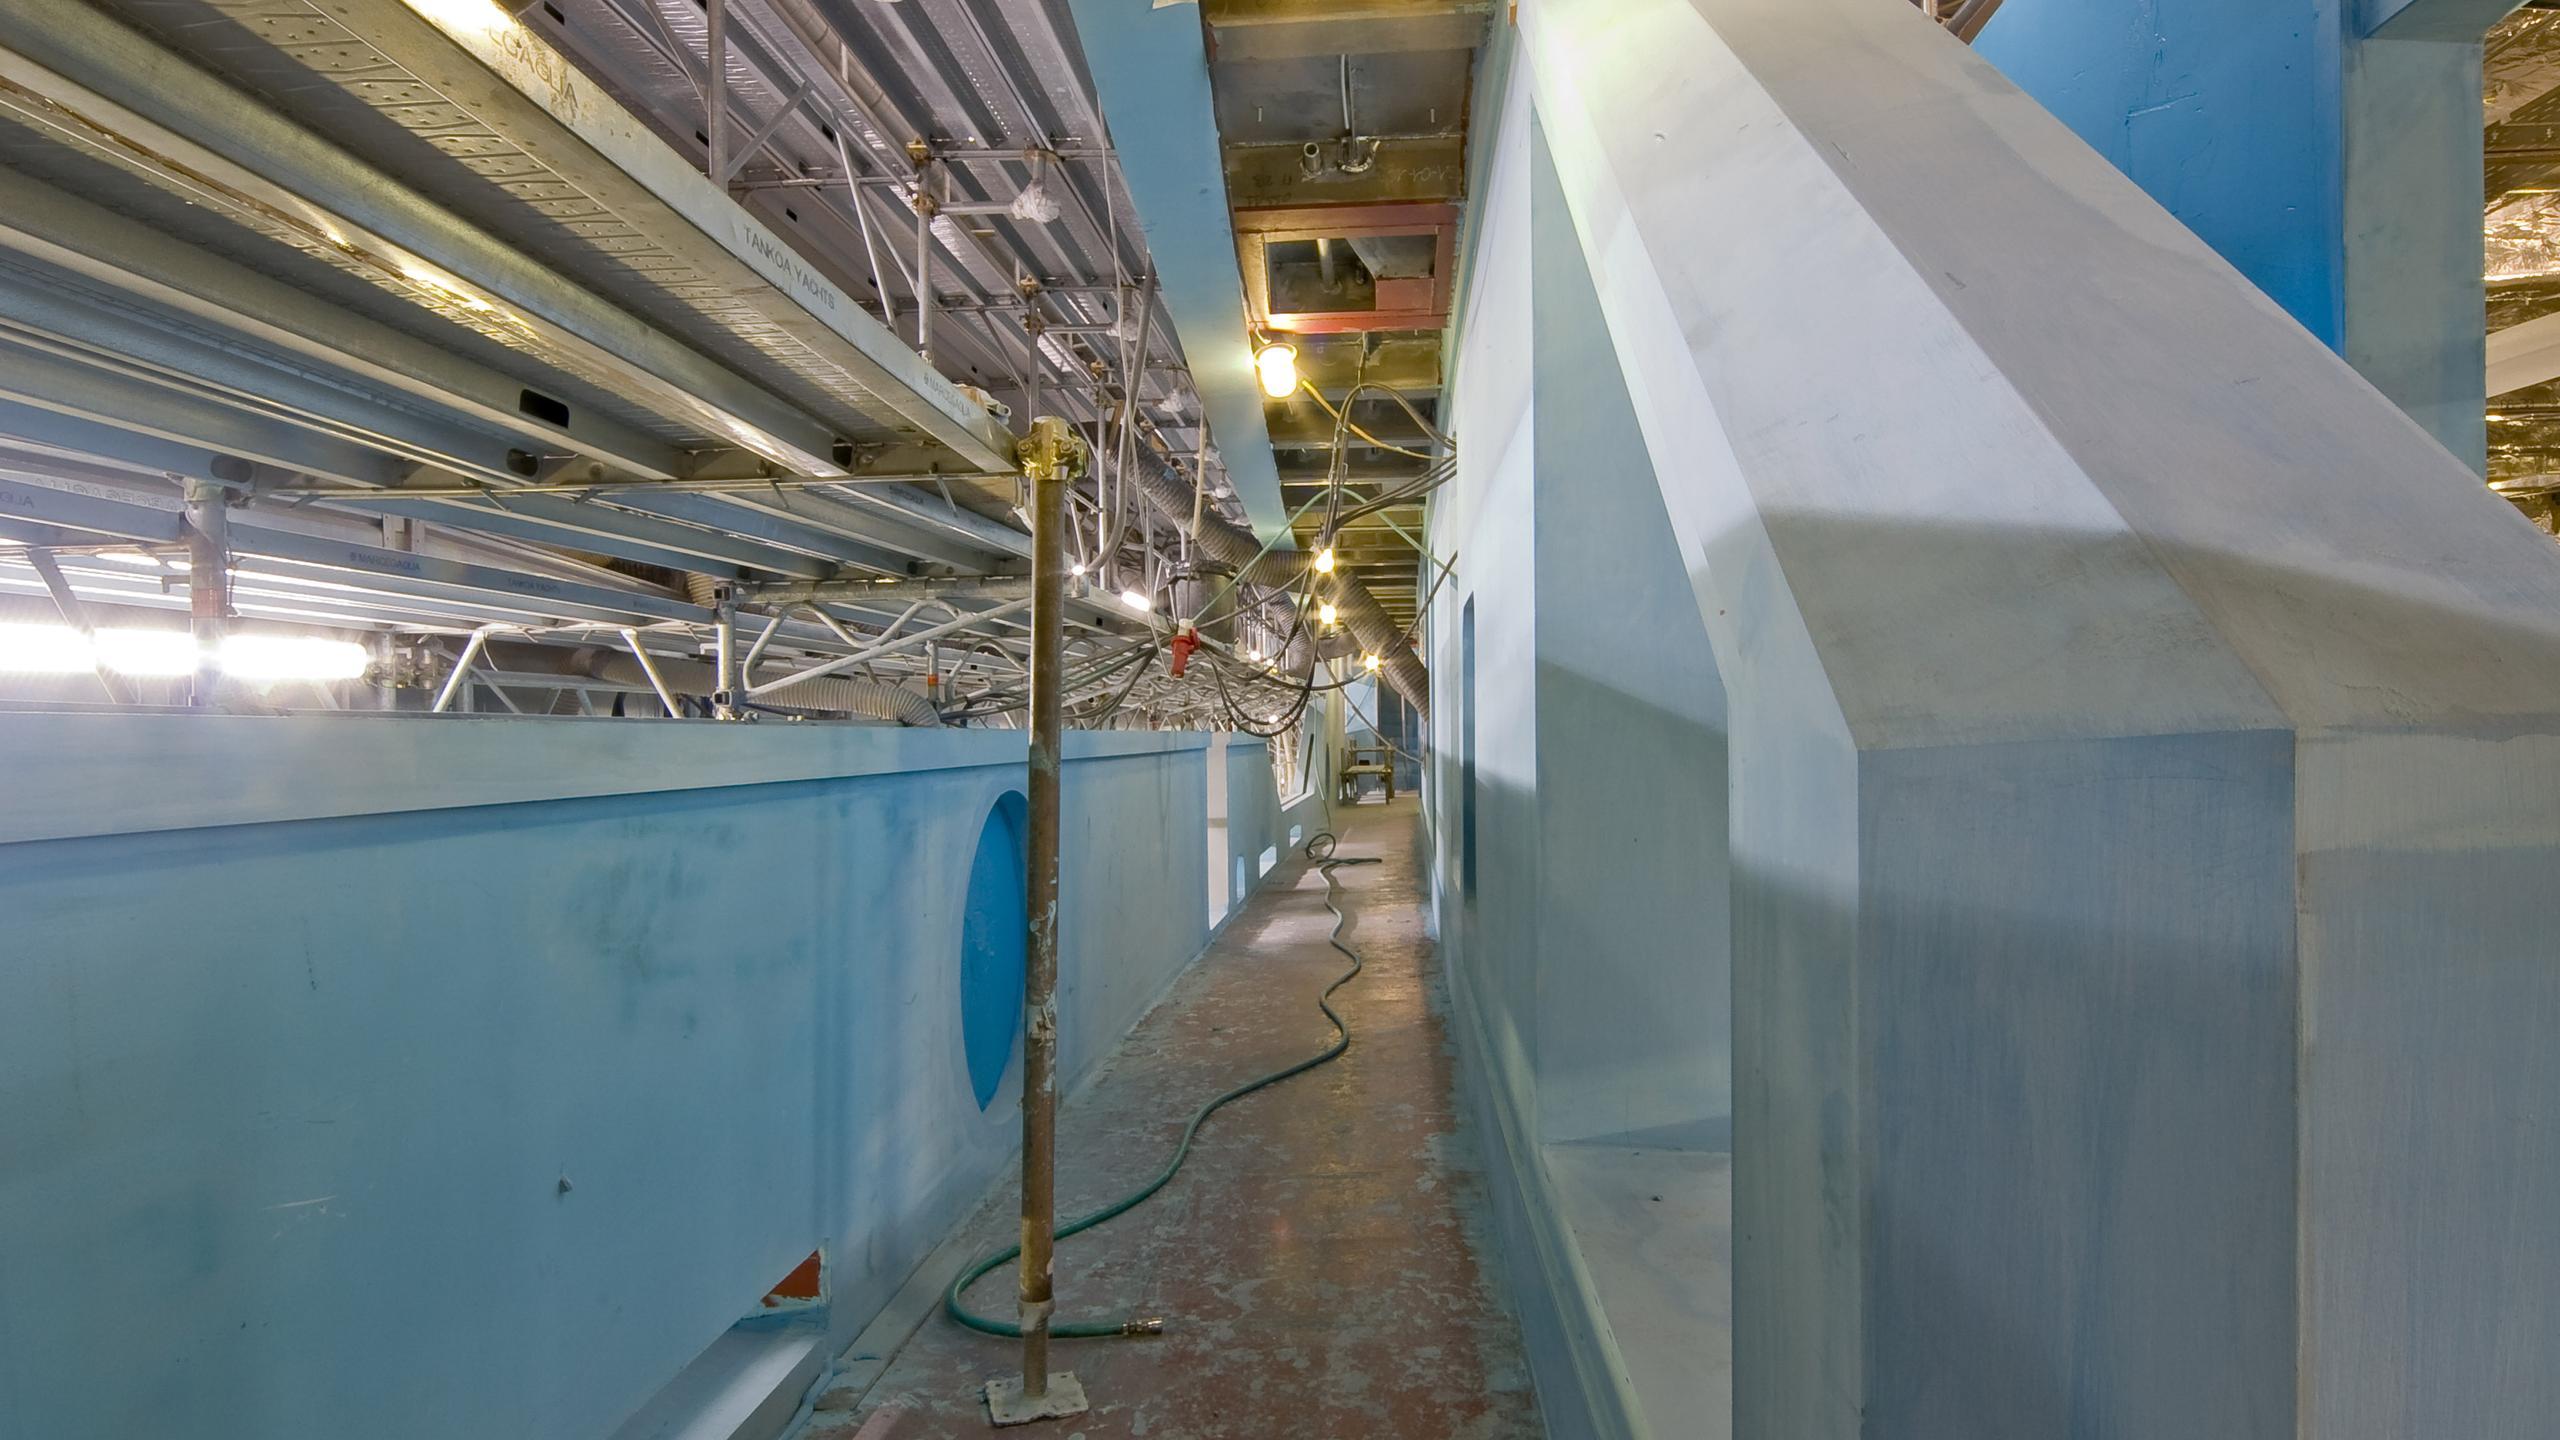 solo s701 motoryacht tankoa yachts 72m 2018 under construction side view